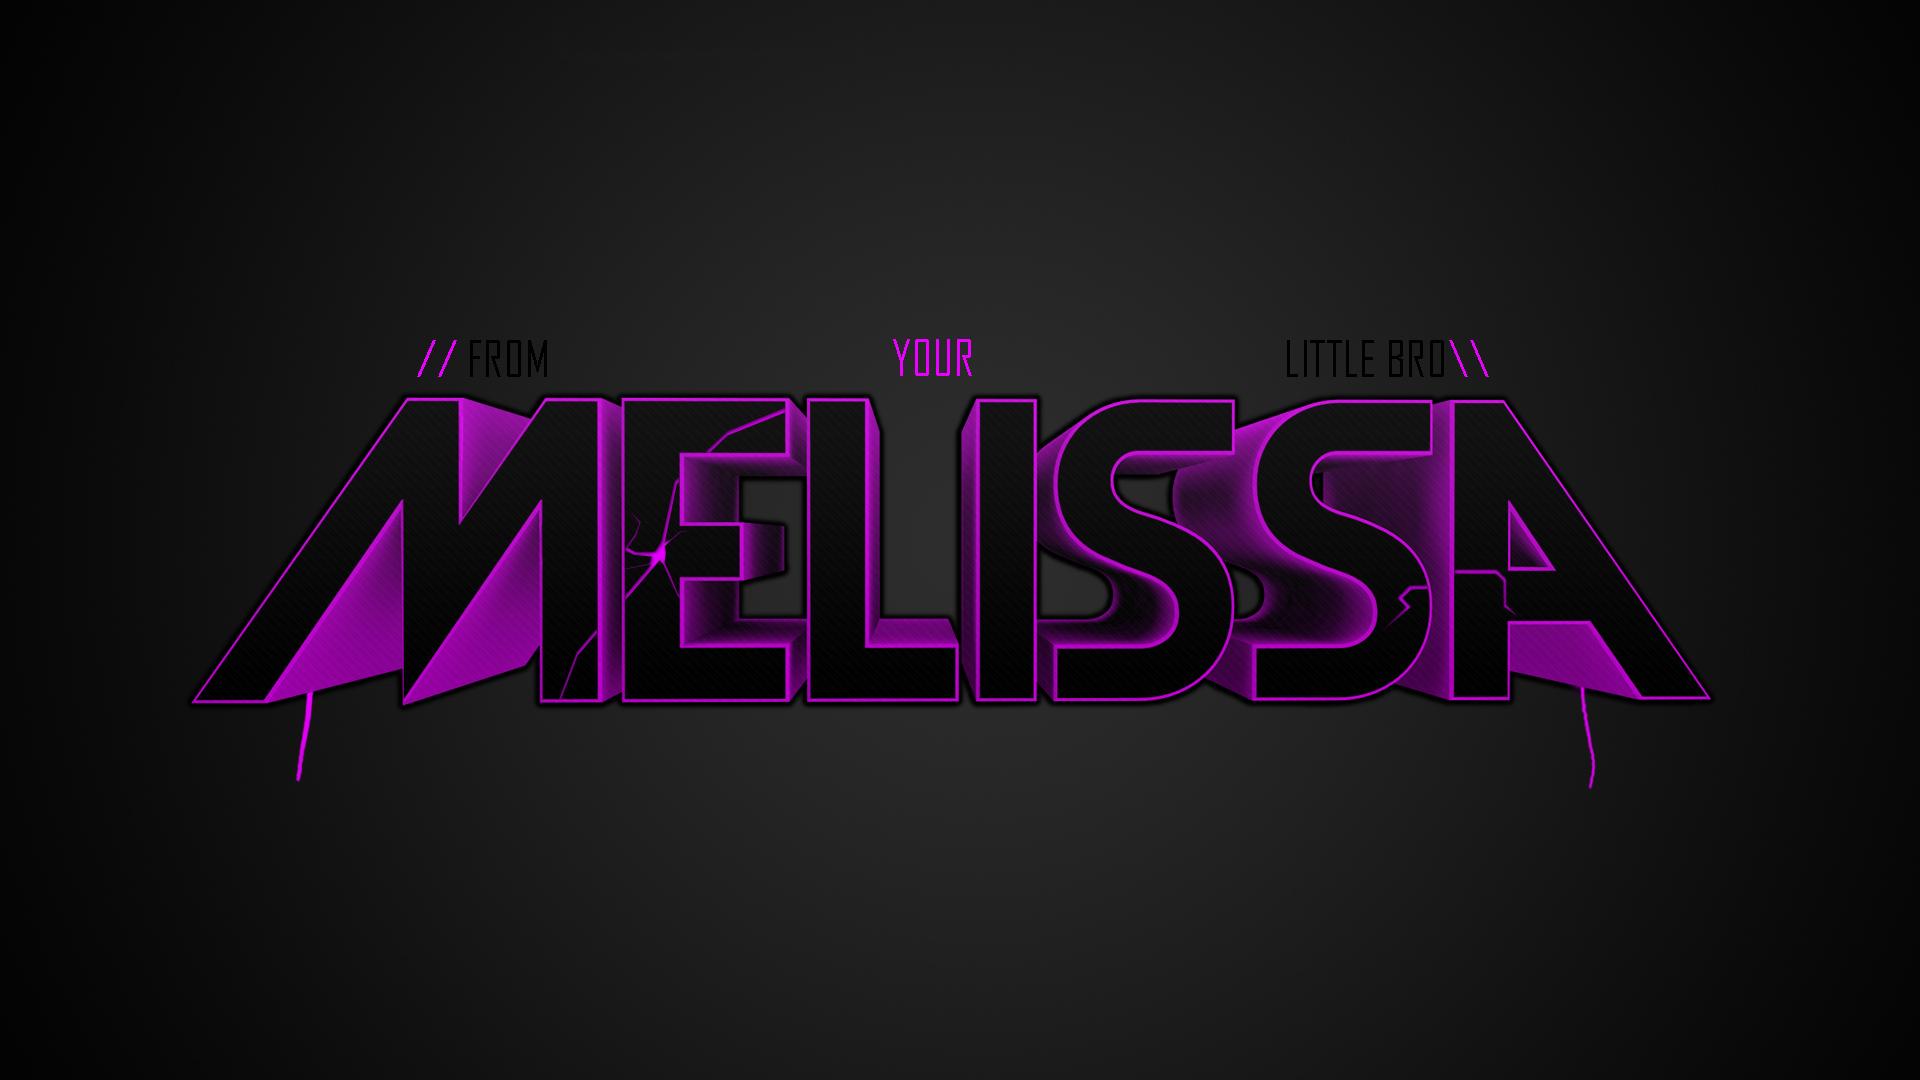 Name melissa wallpaper wallpapersafari - A and s name wallpaper ...